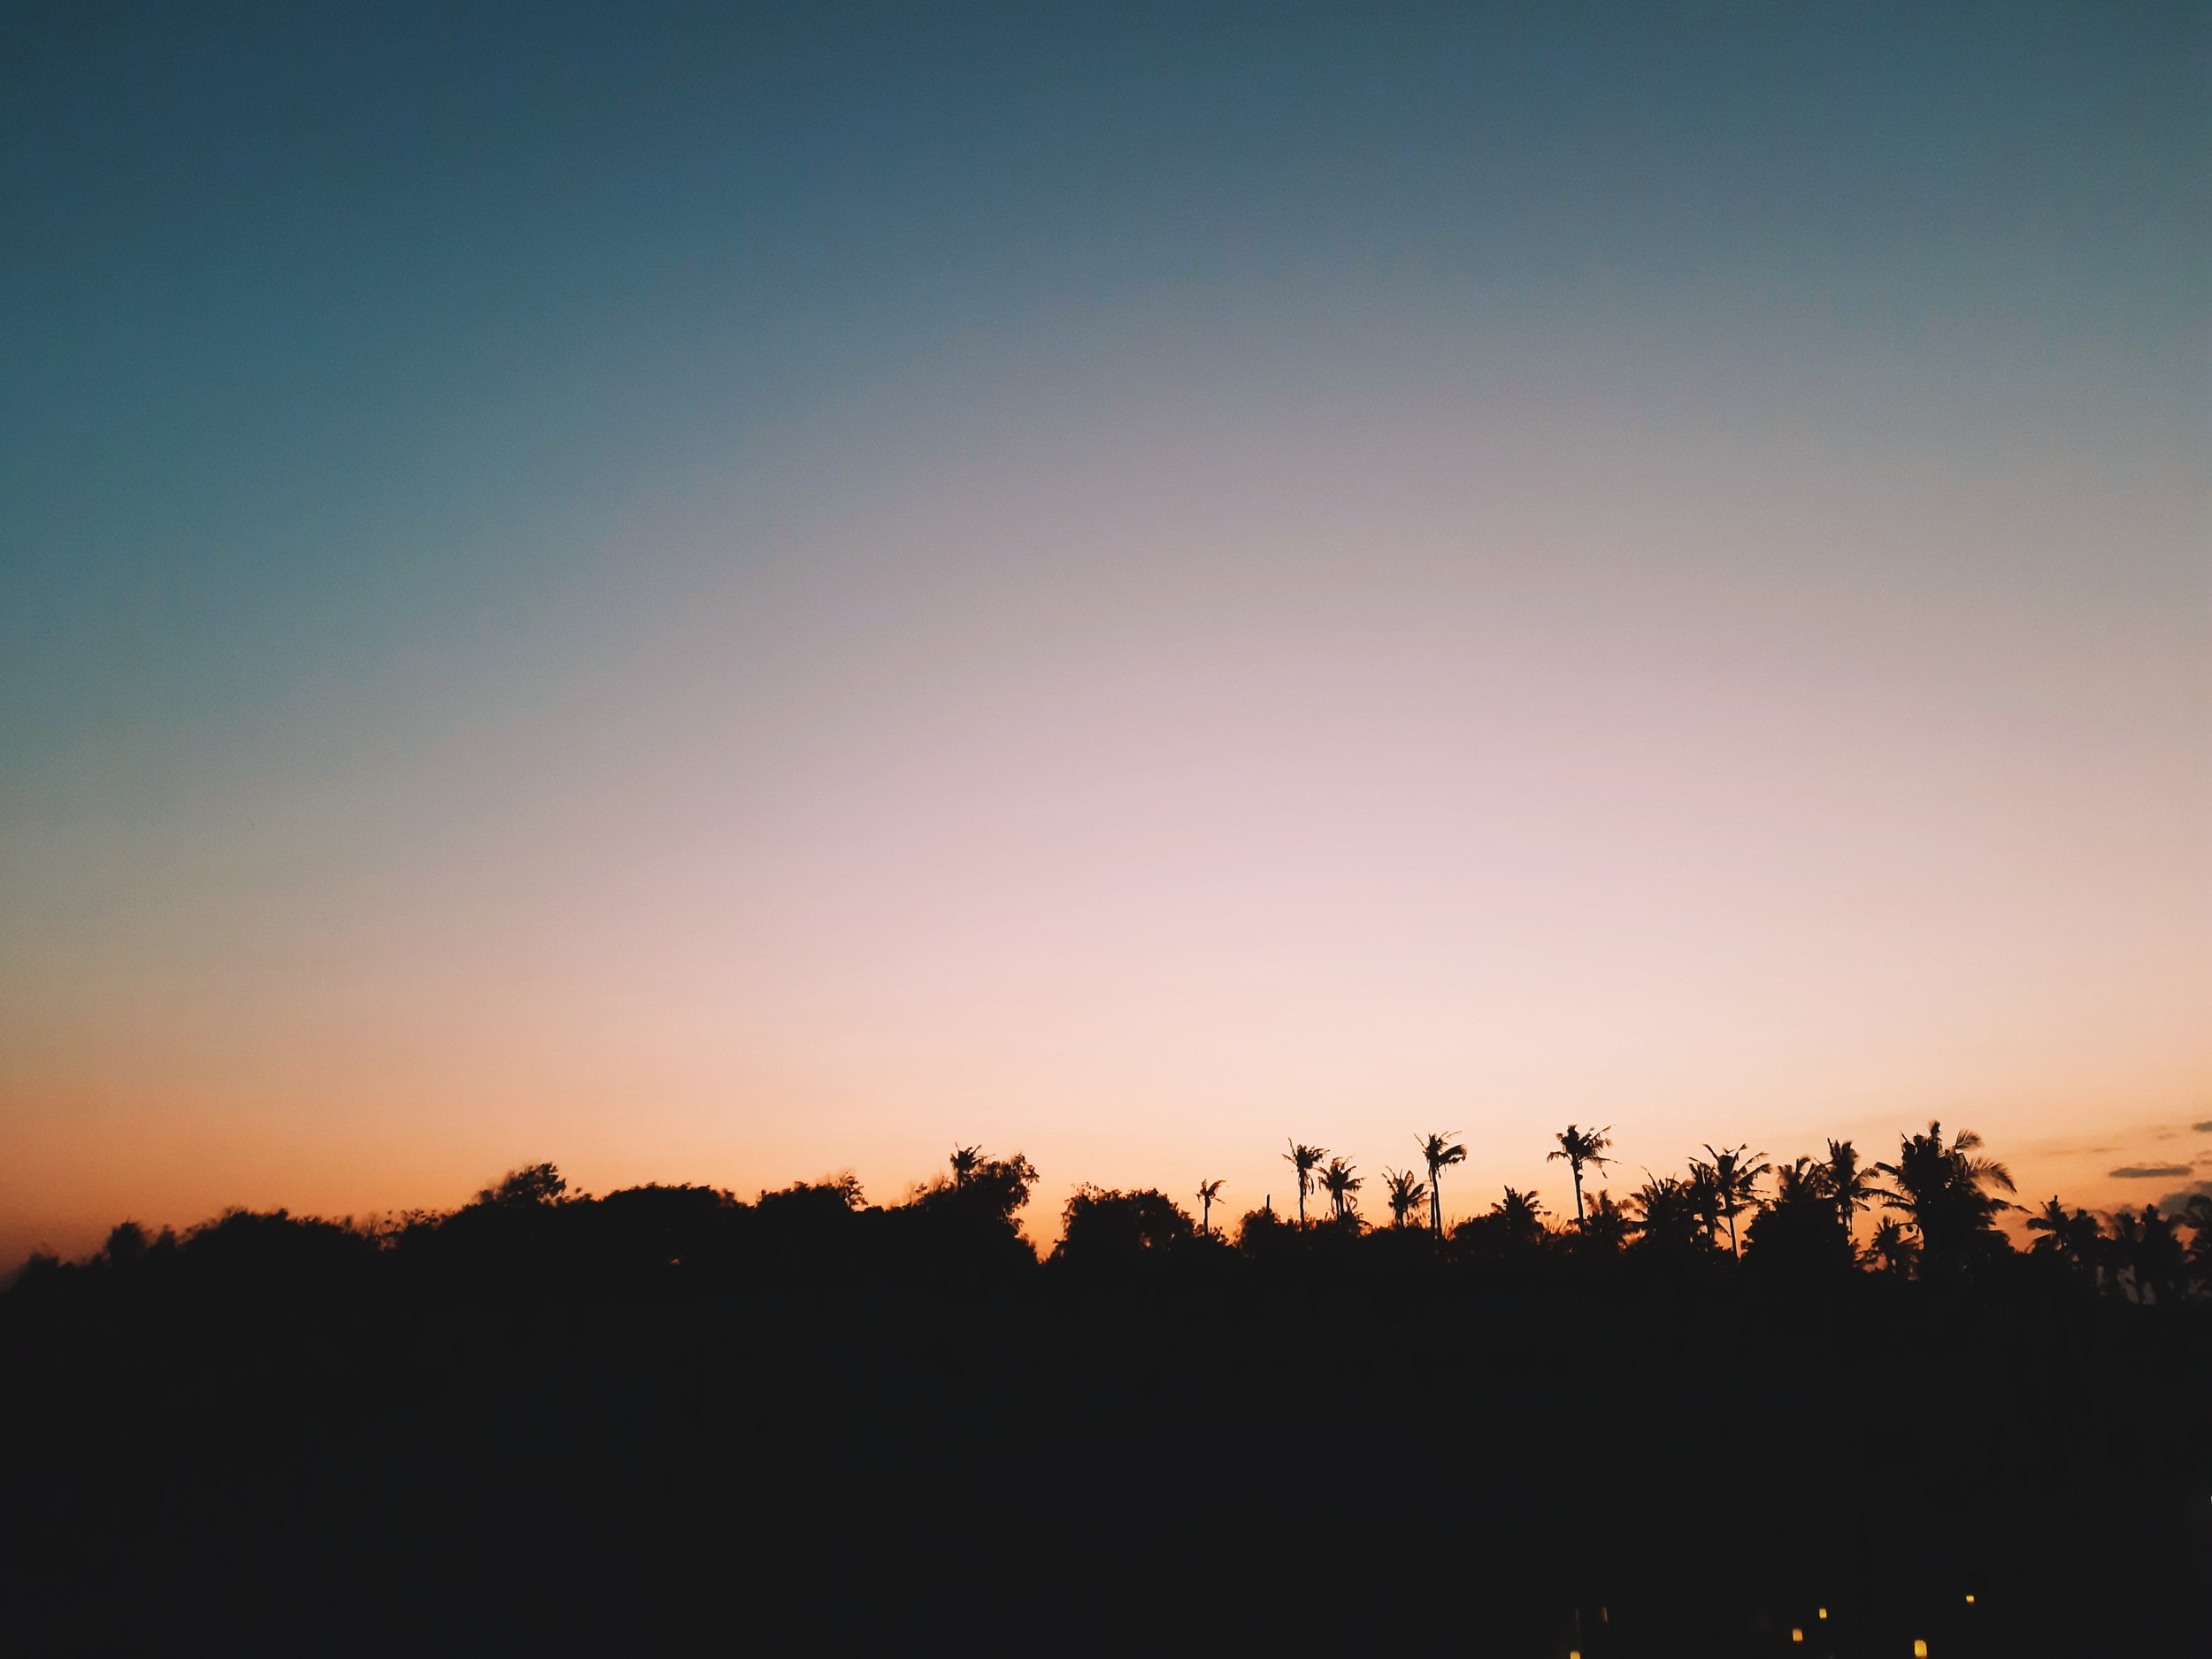 sunset in bali.jpg